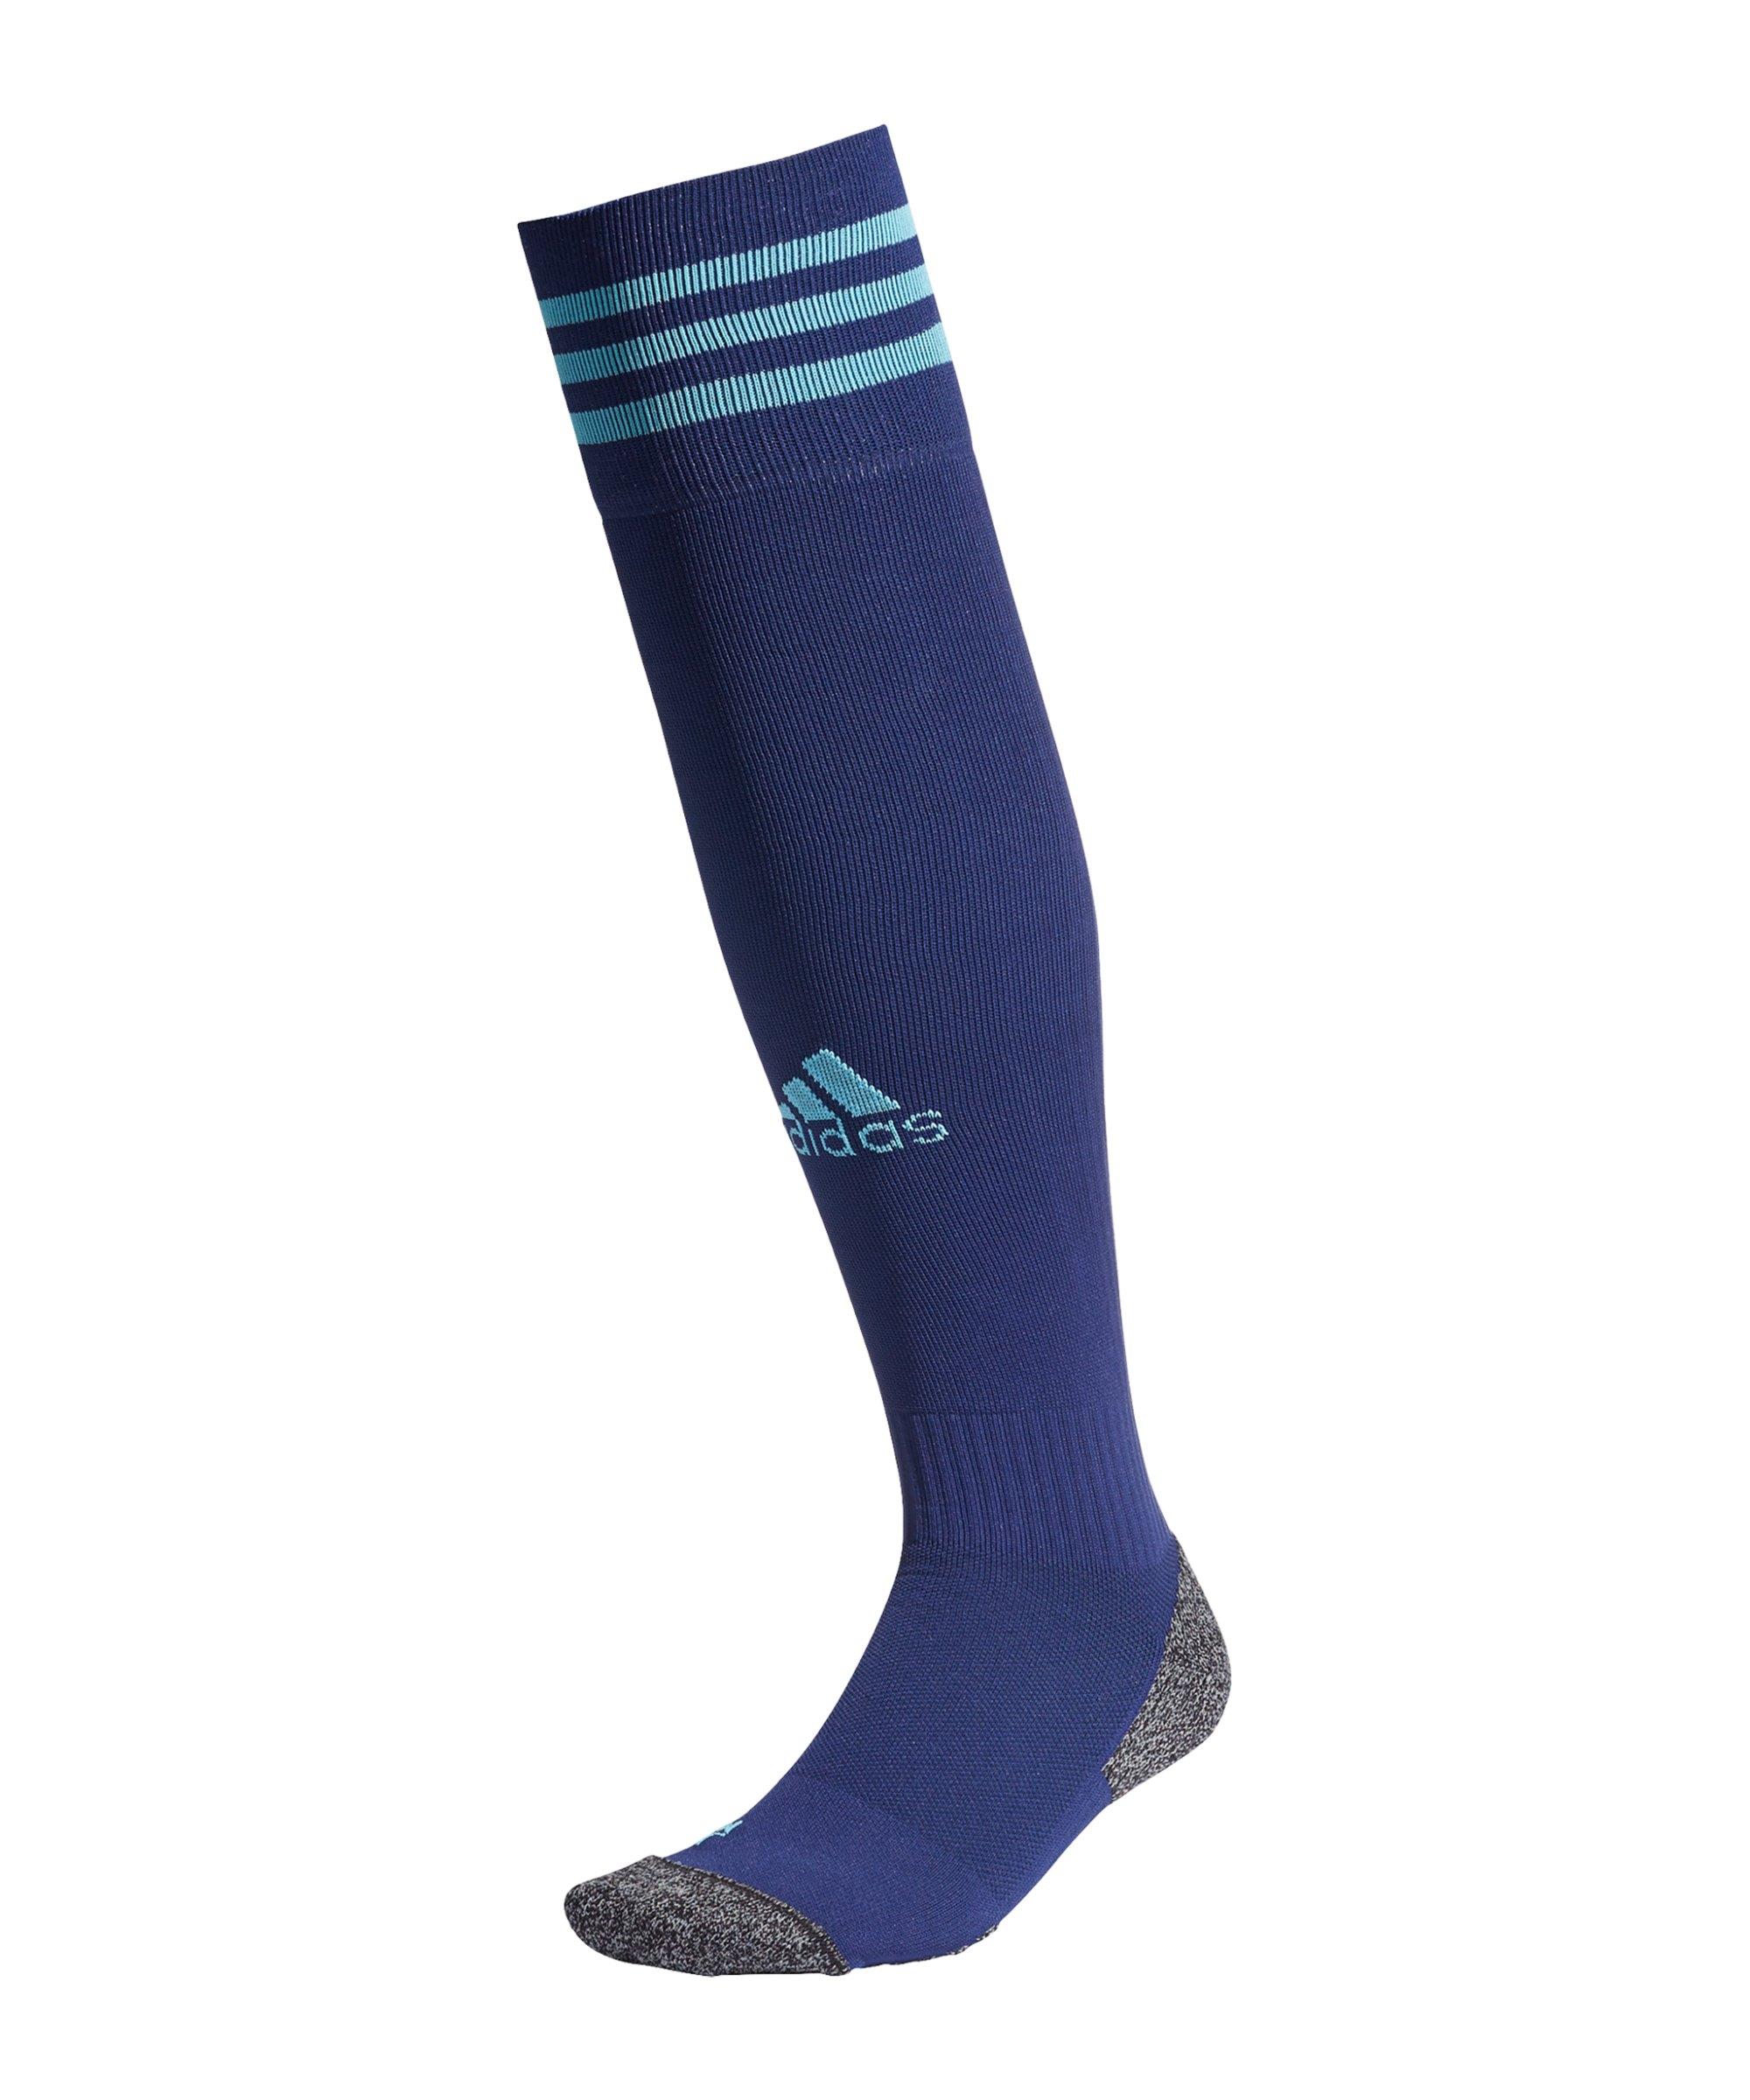 adidas Adisock 21 Strumpfstutzen Blau - blau